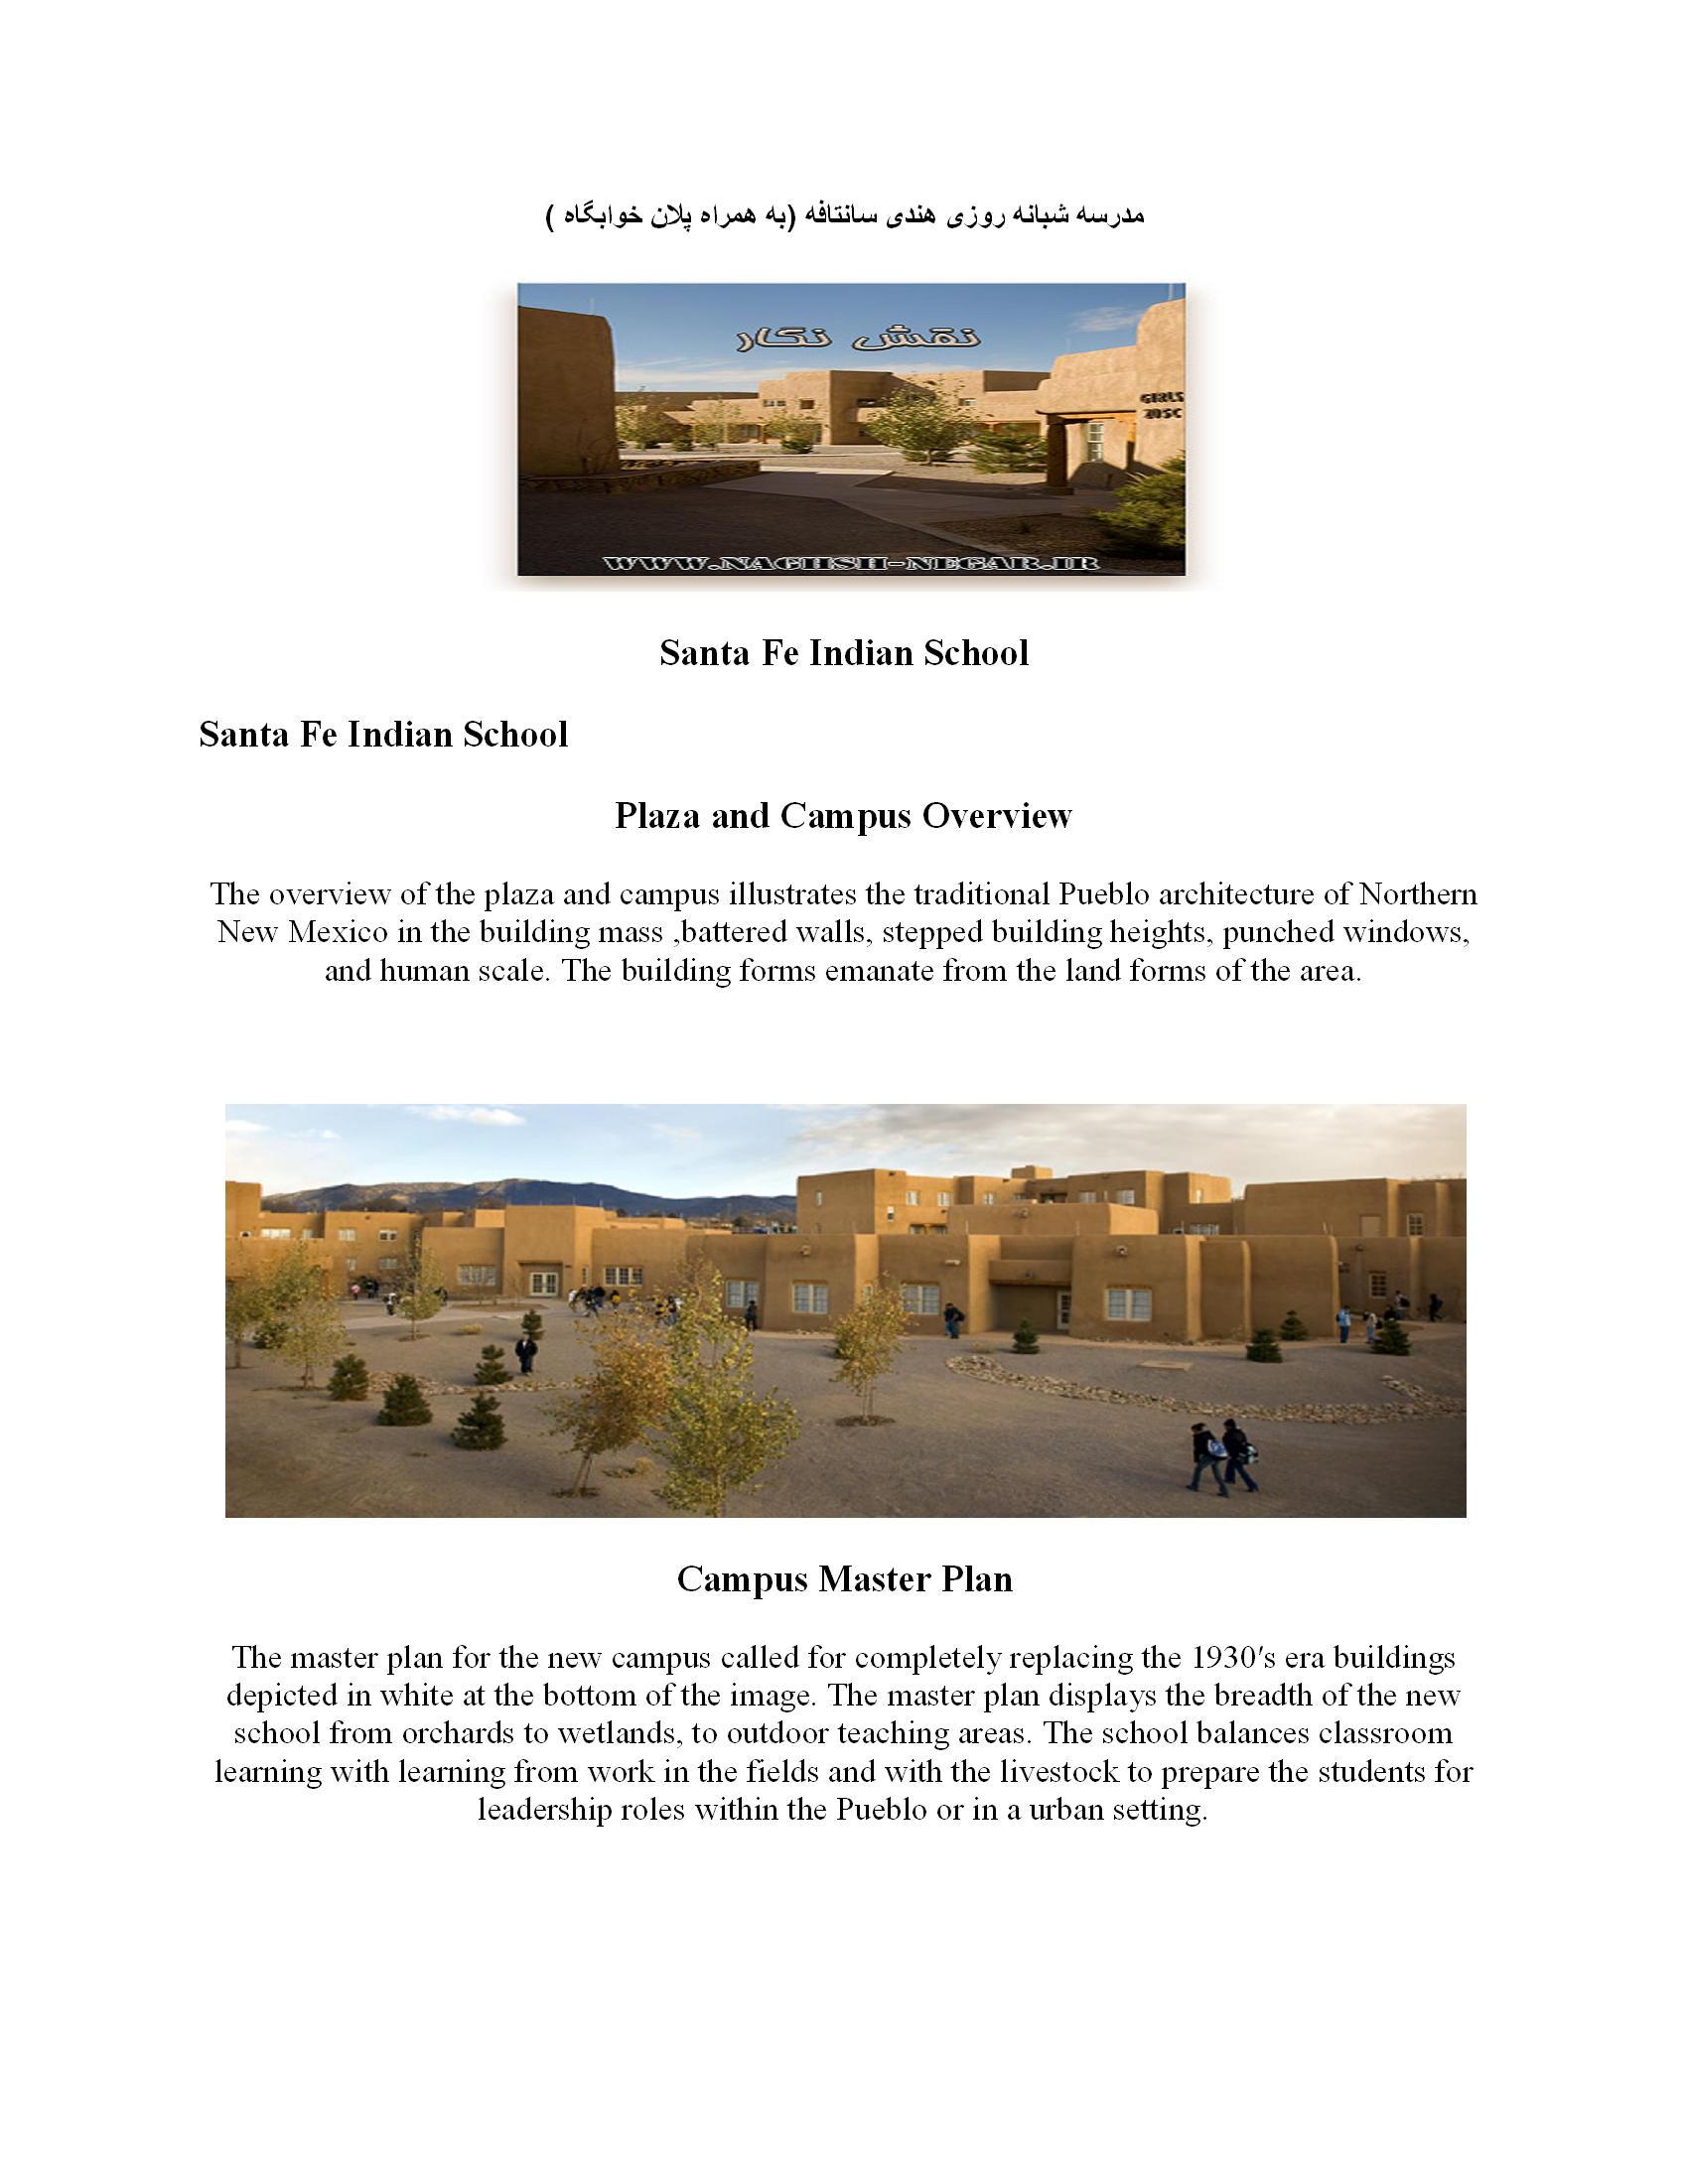 Santa Fe Indian School 14